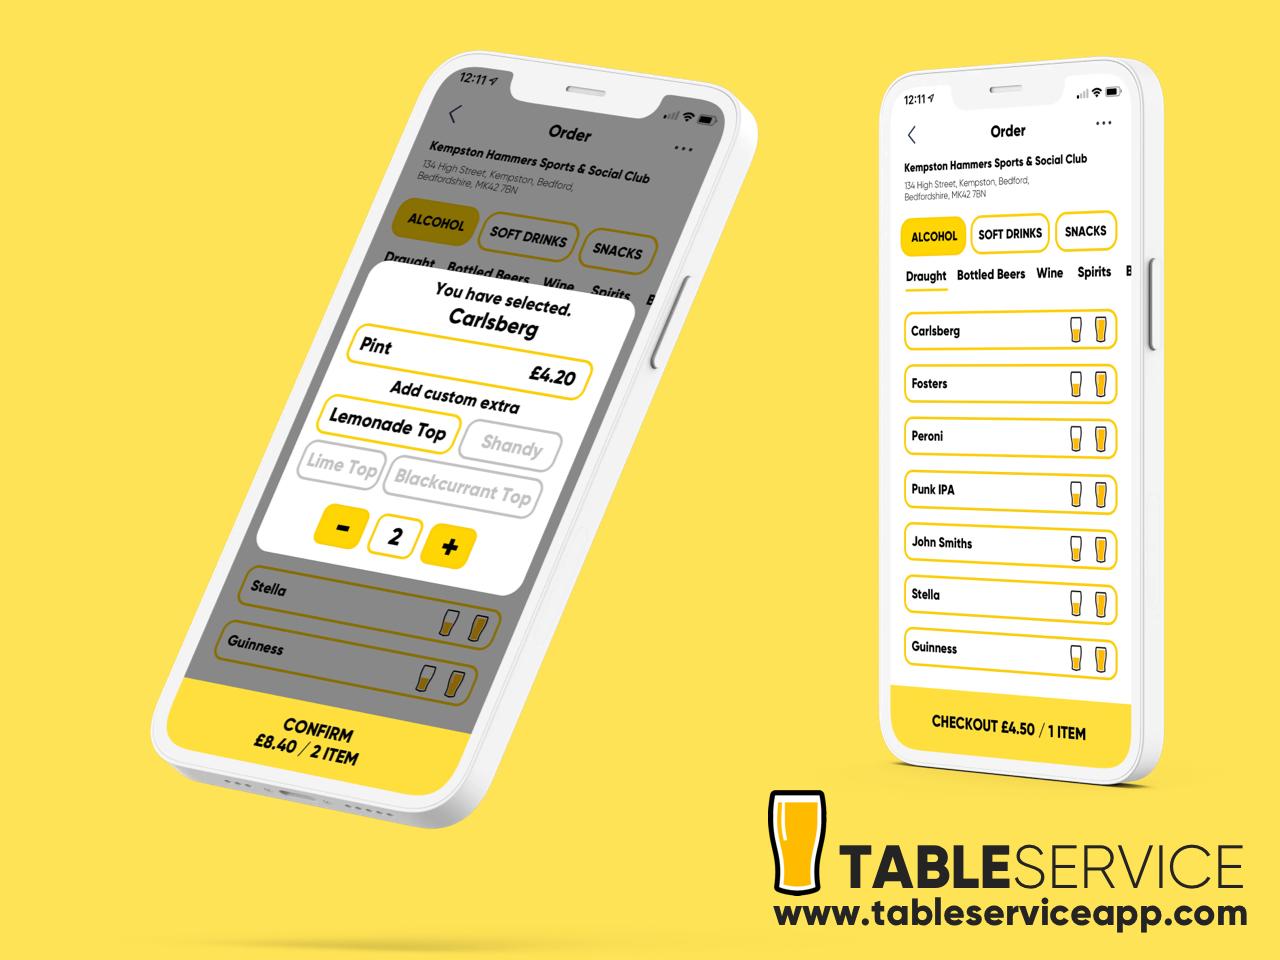 Leading App Developer Takes On Table Service Challenge